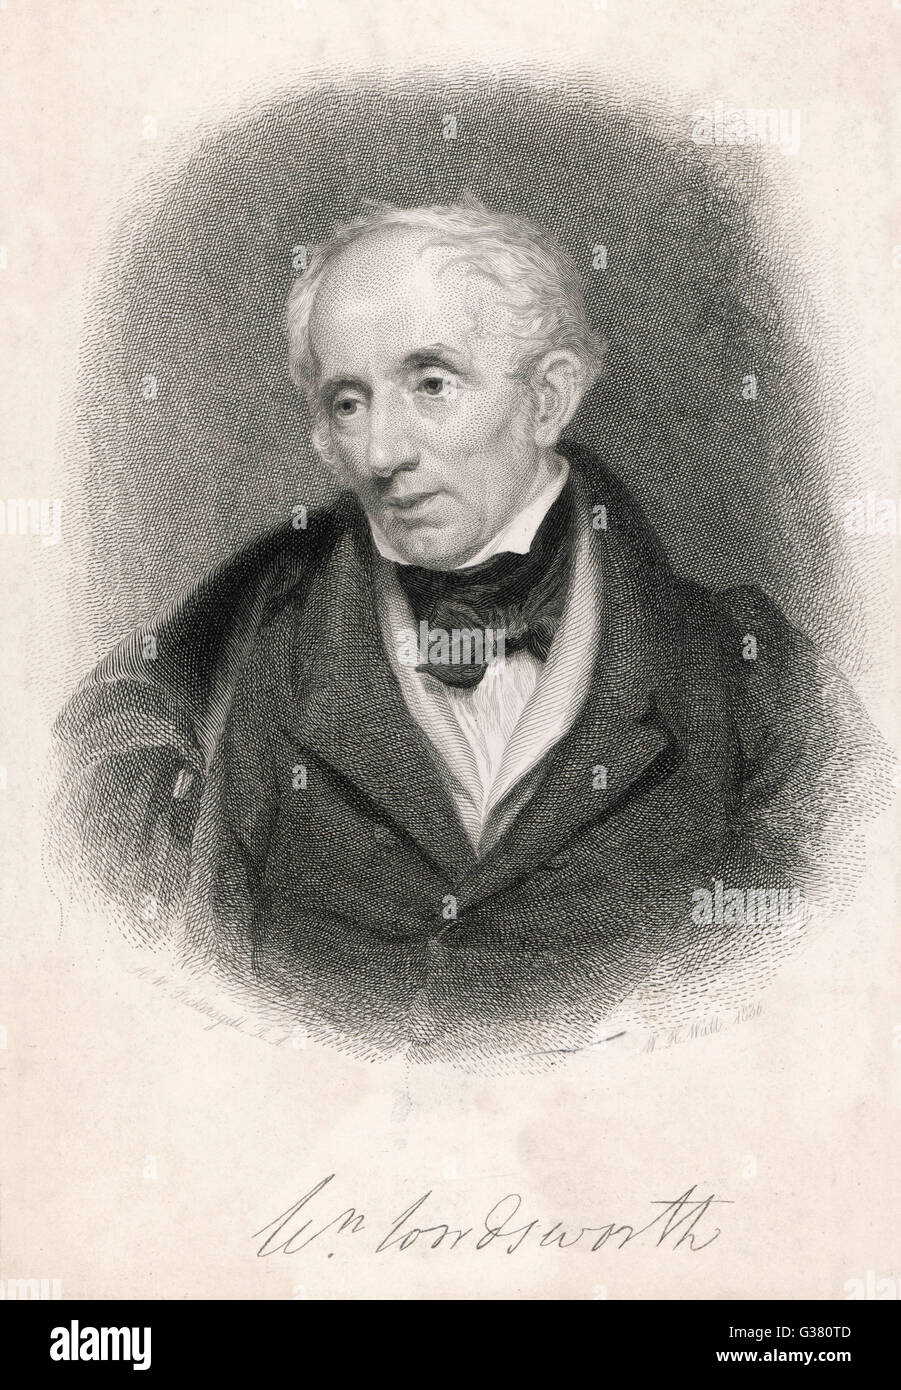 WILLIAM WORDSWORTH  English poet  In 1836      Date: 1770 - 1850 - Stock Image